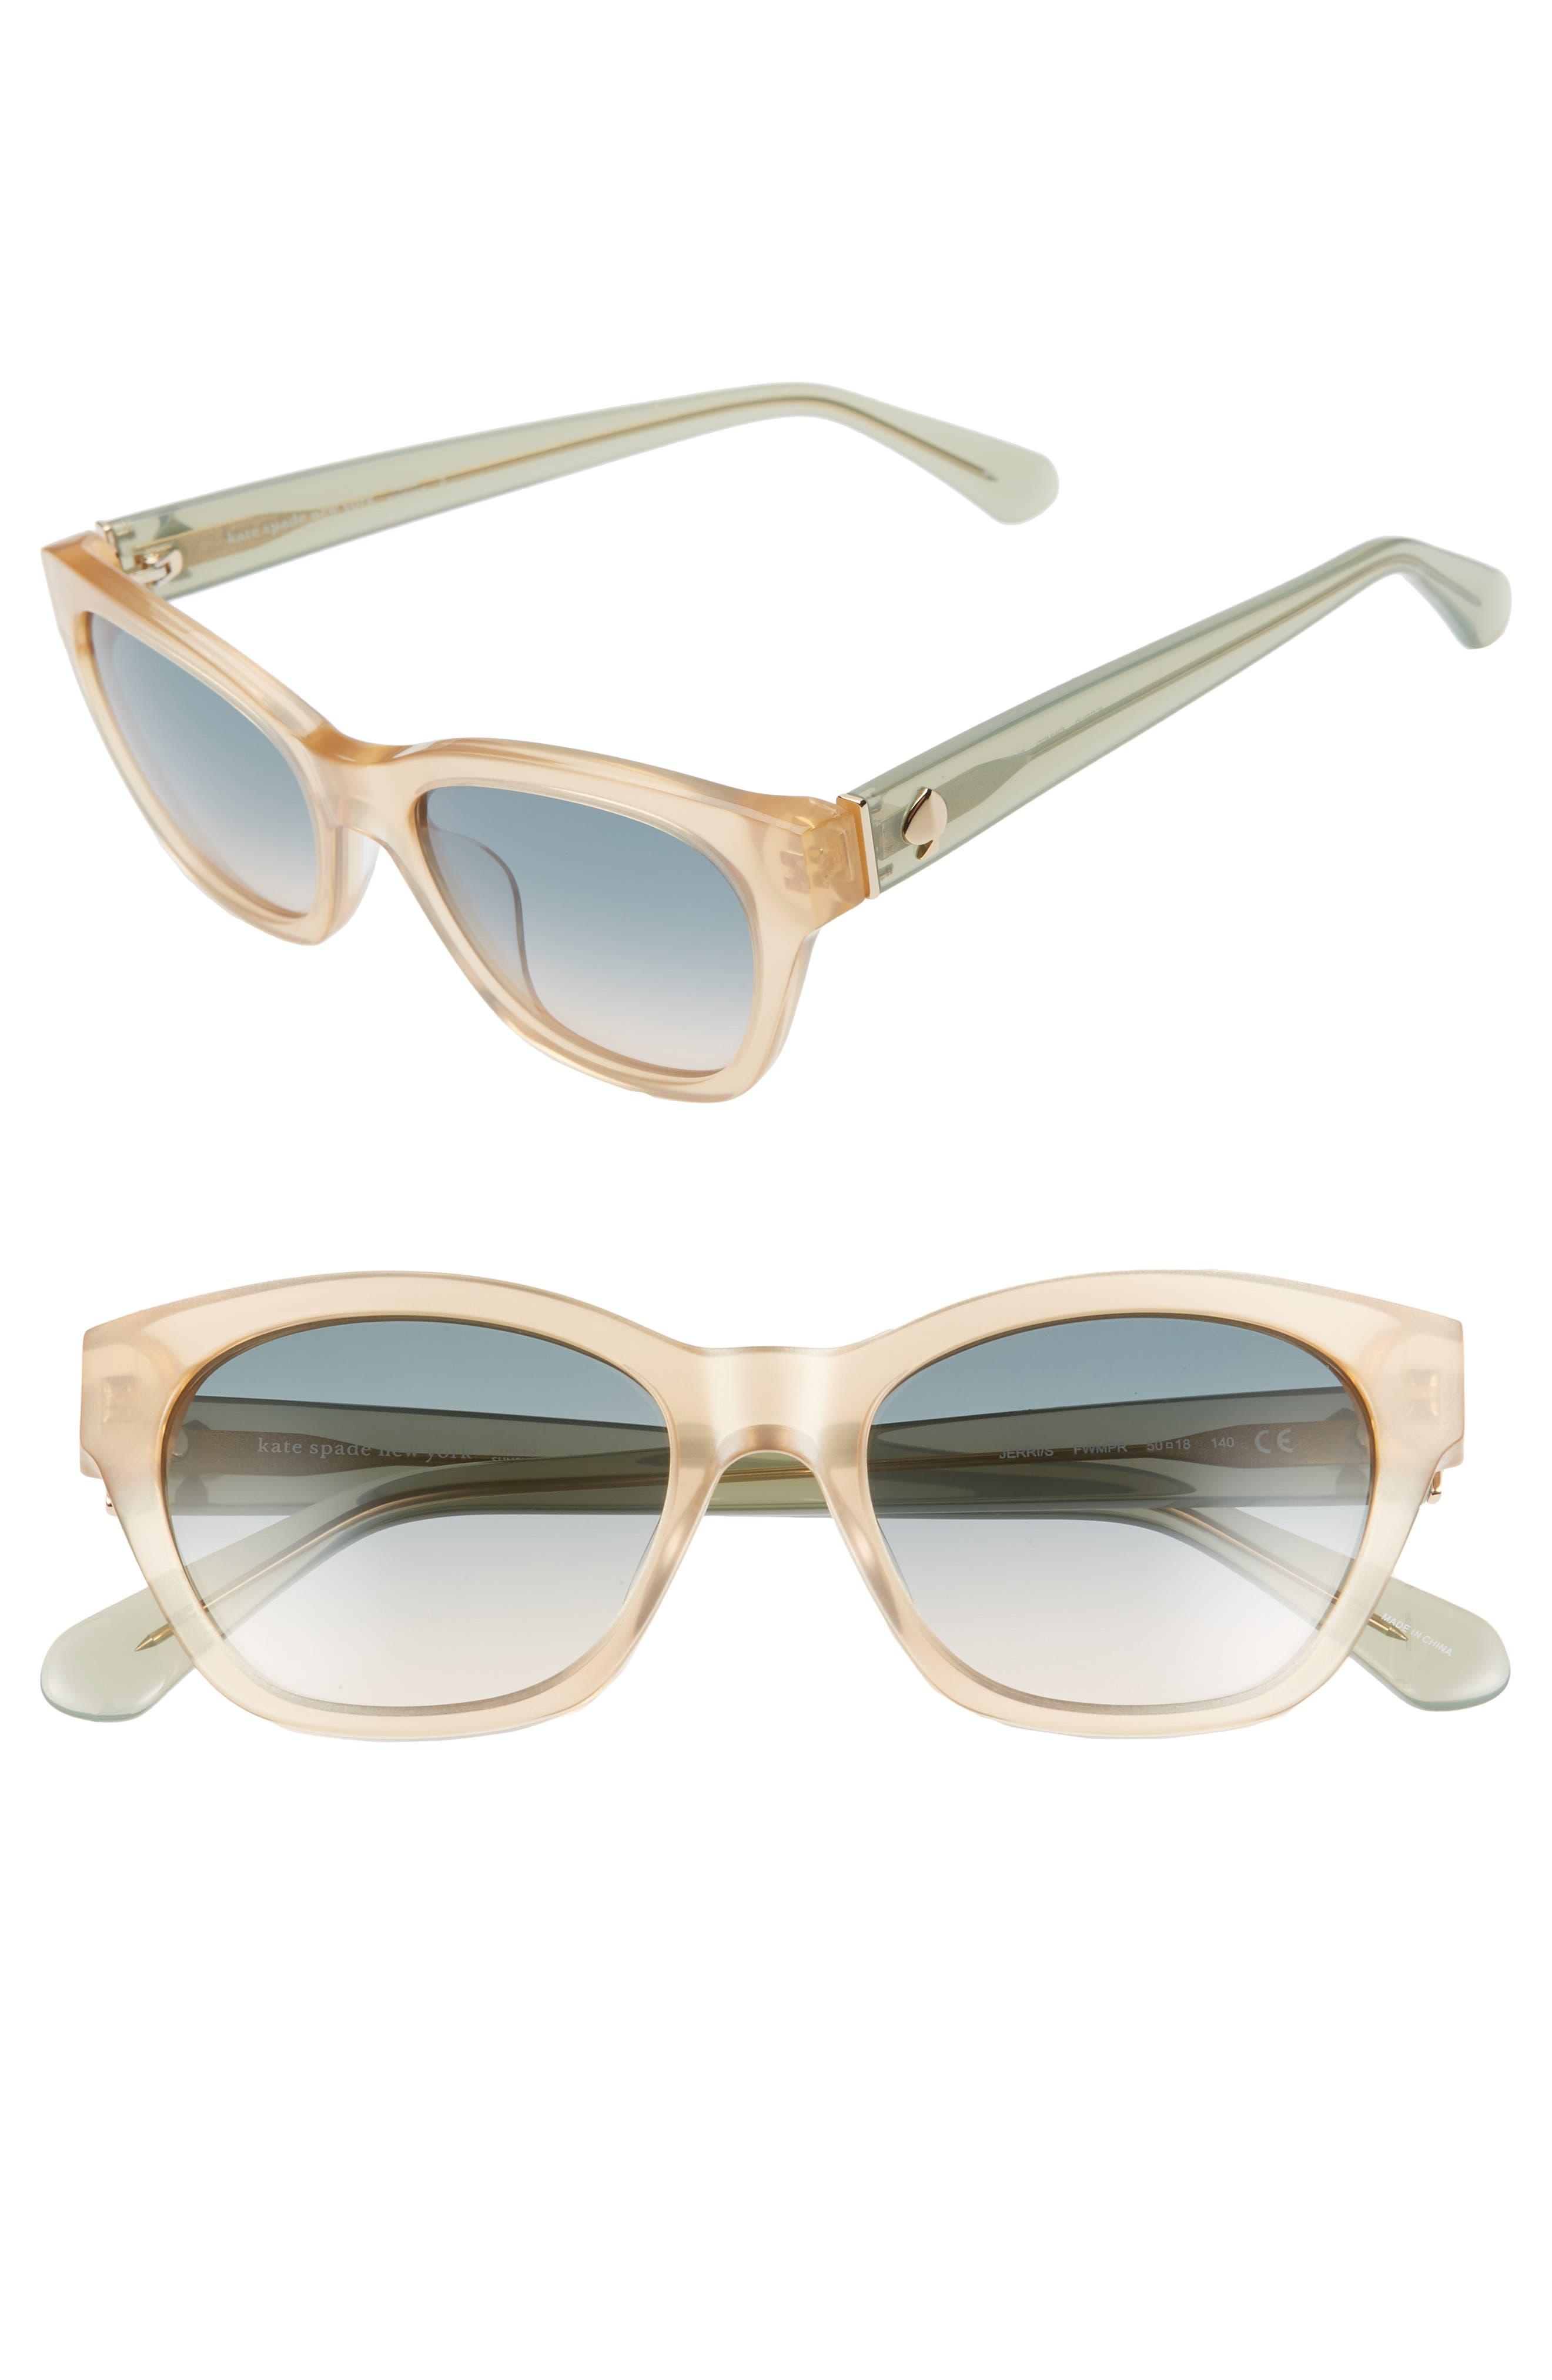 2548903b40e6 Kate Spade New York Jerris 50Mm Cat Eye Sunglasses - Nude